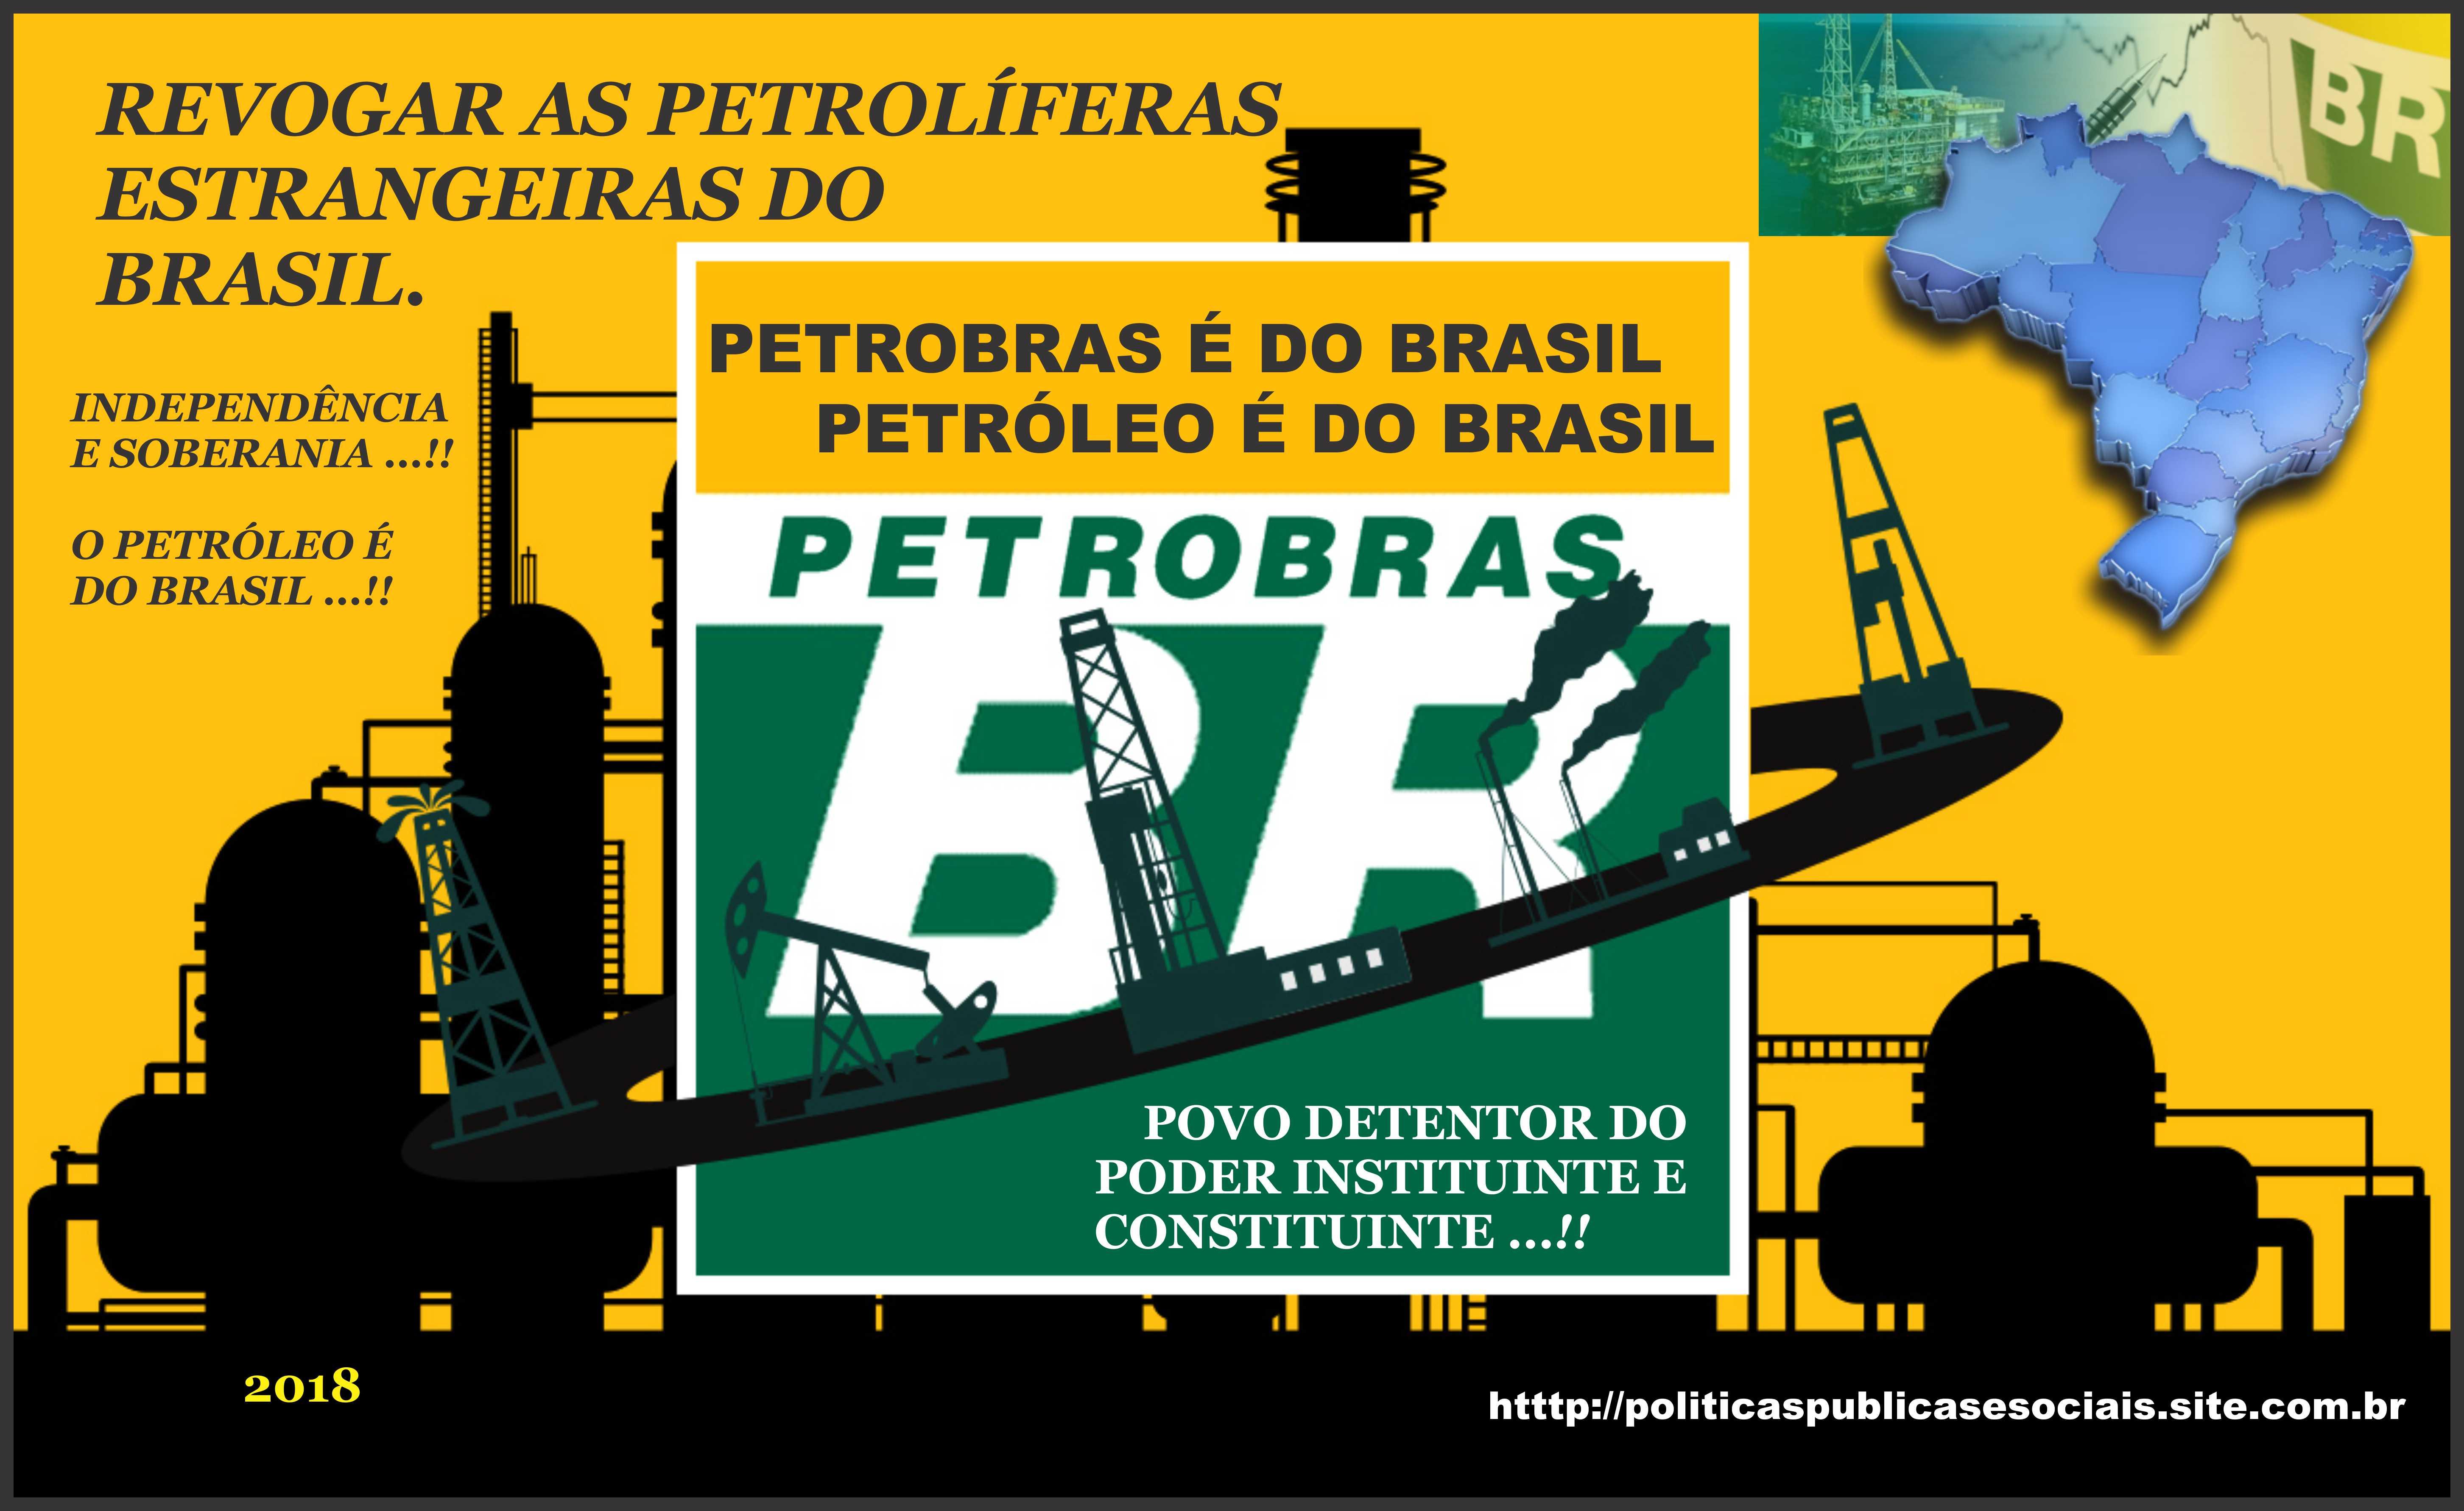 O PETRÓLEO É DO BRASIL 04 2018